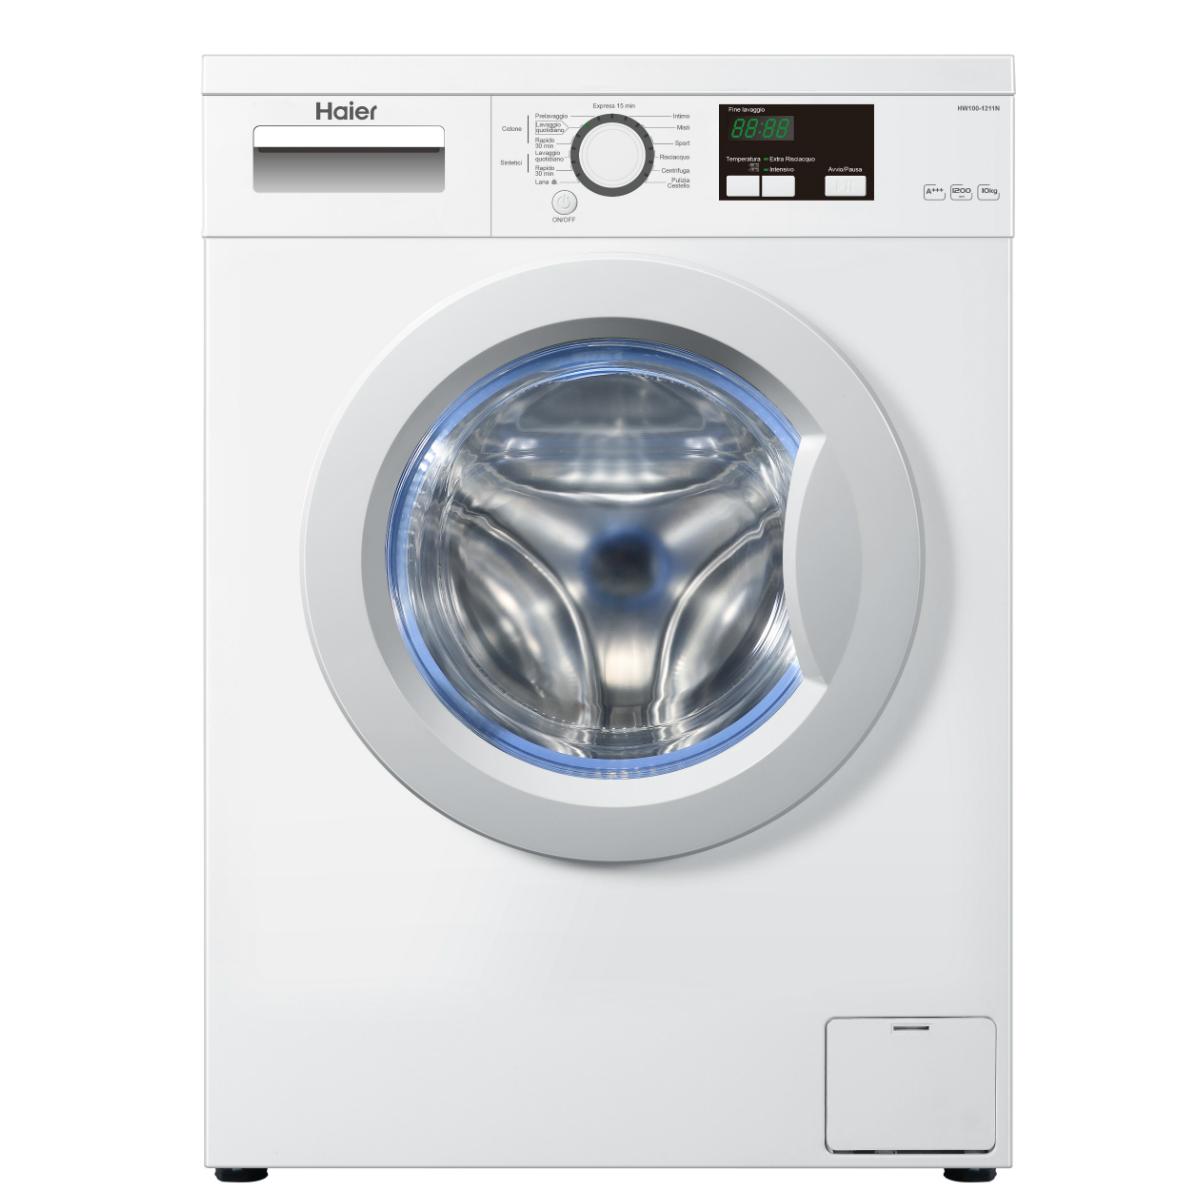 Lavatrice haier hw100 1211n caratteristiche lavatrice - Lavatrice altezza 75 ...